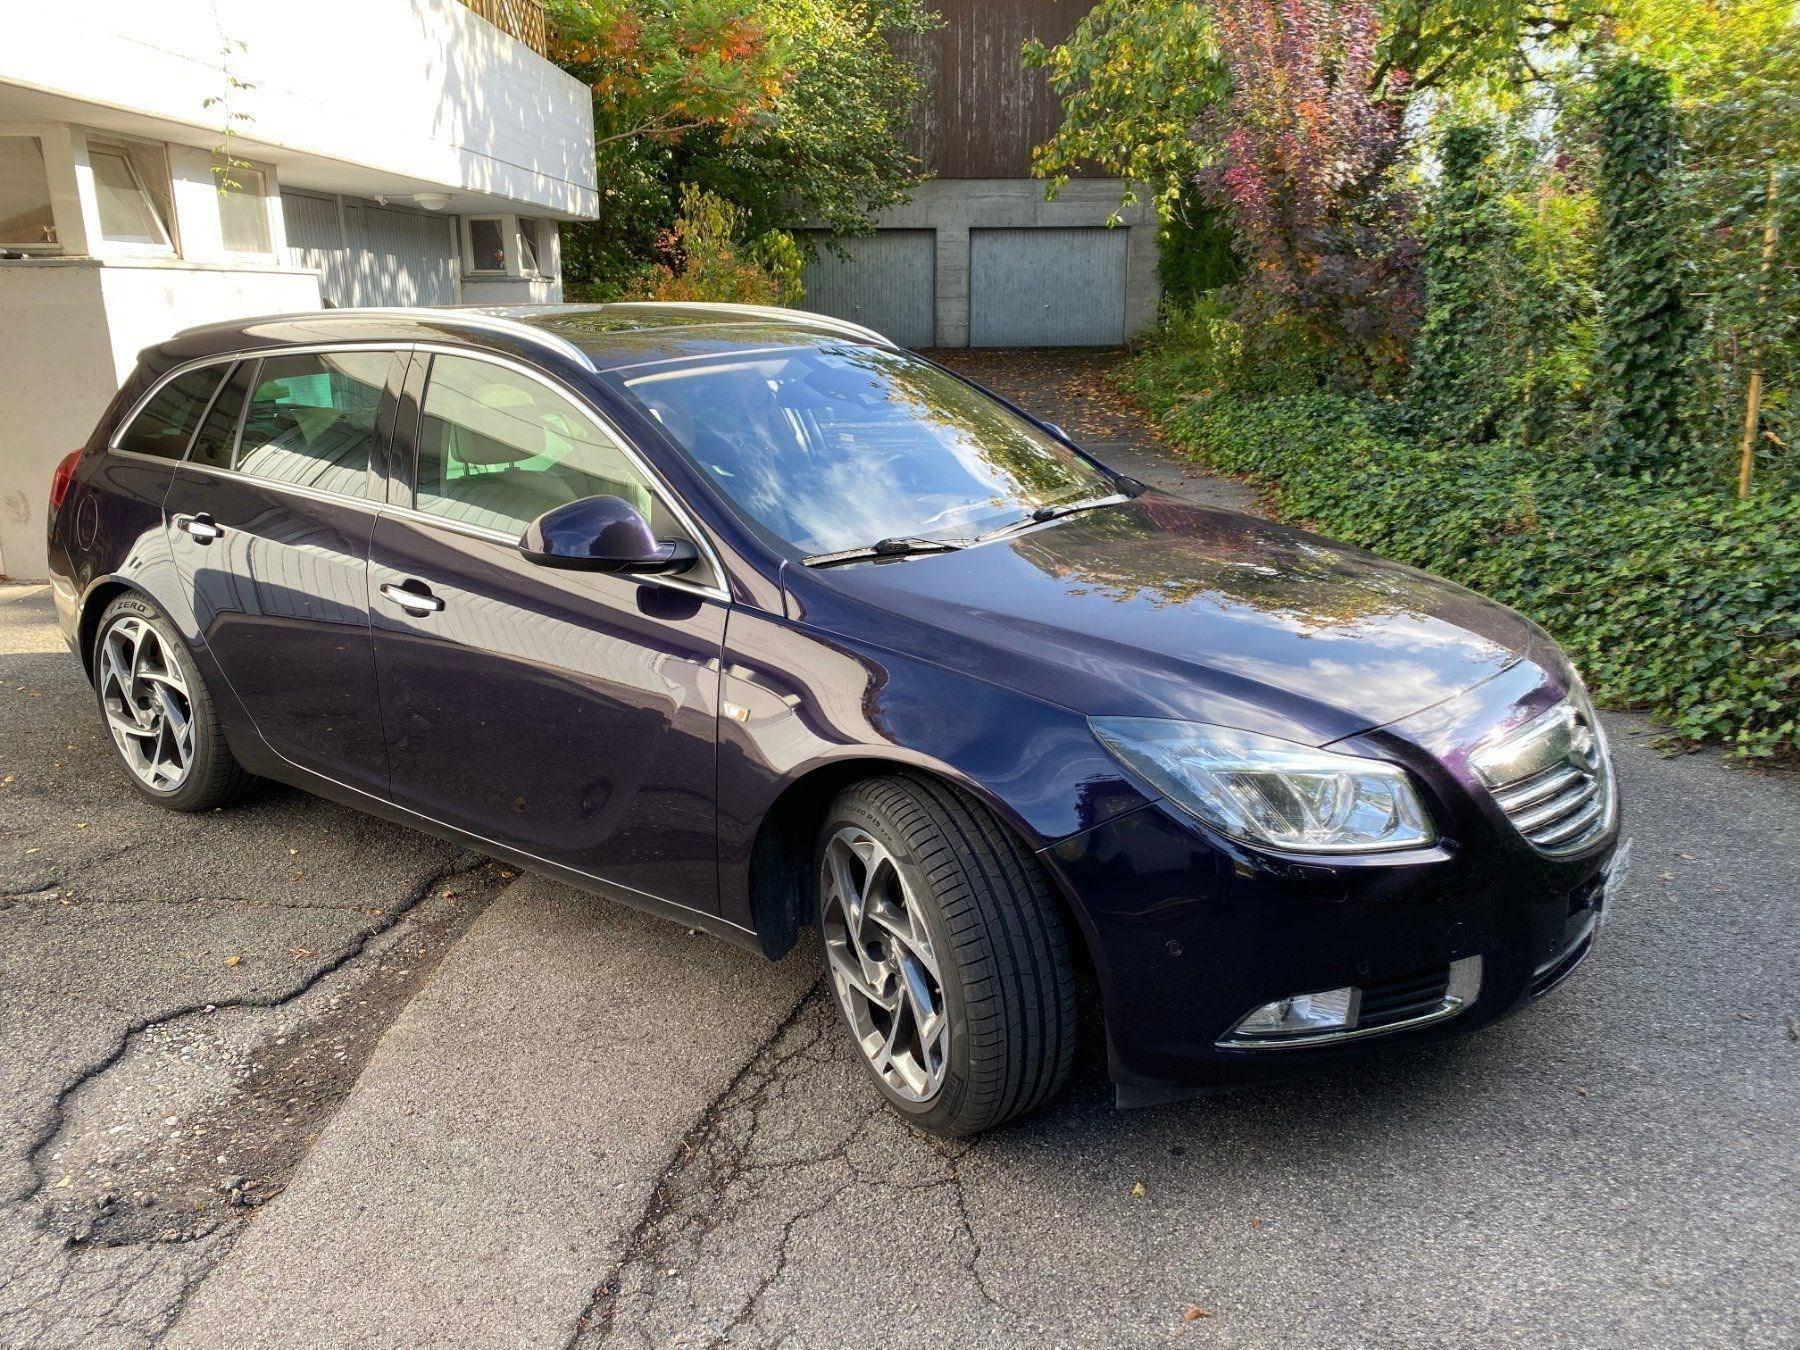 Opel Insignia Sports Tourer 2.0 CDTi 195 4x4 Cosmo